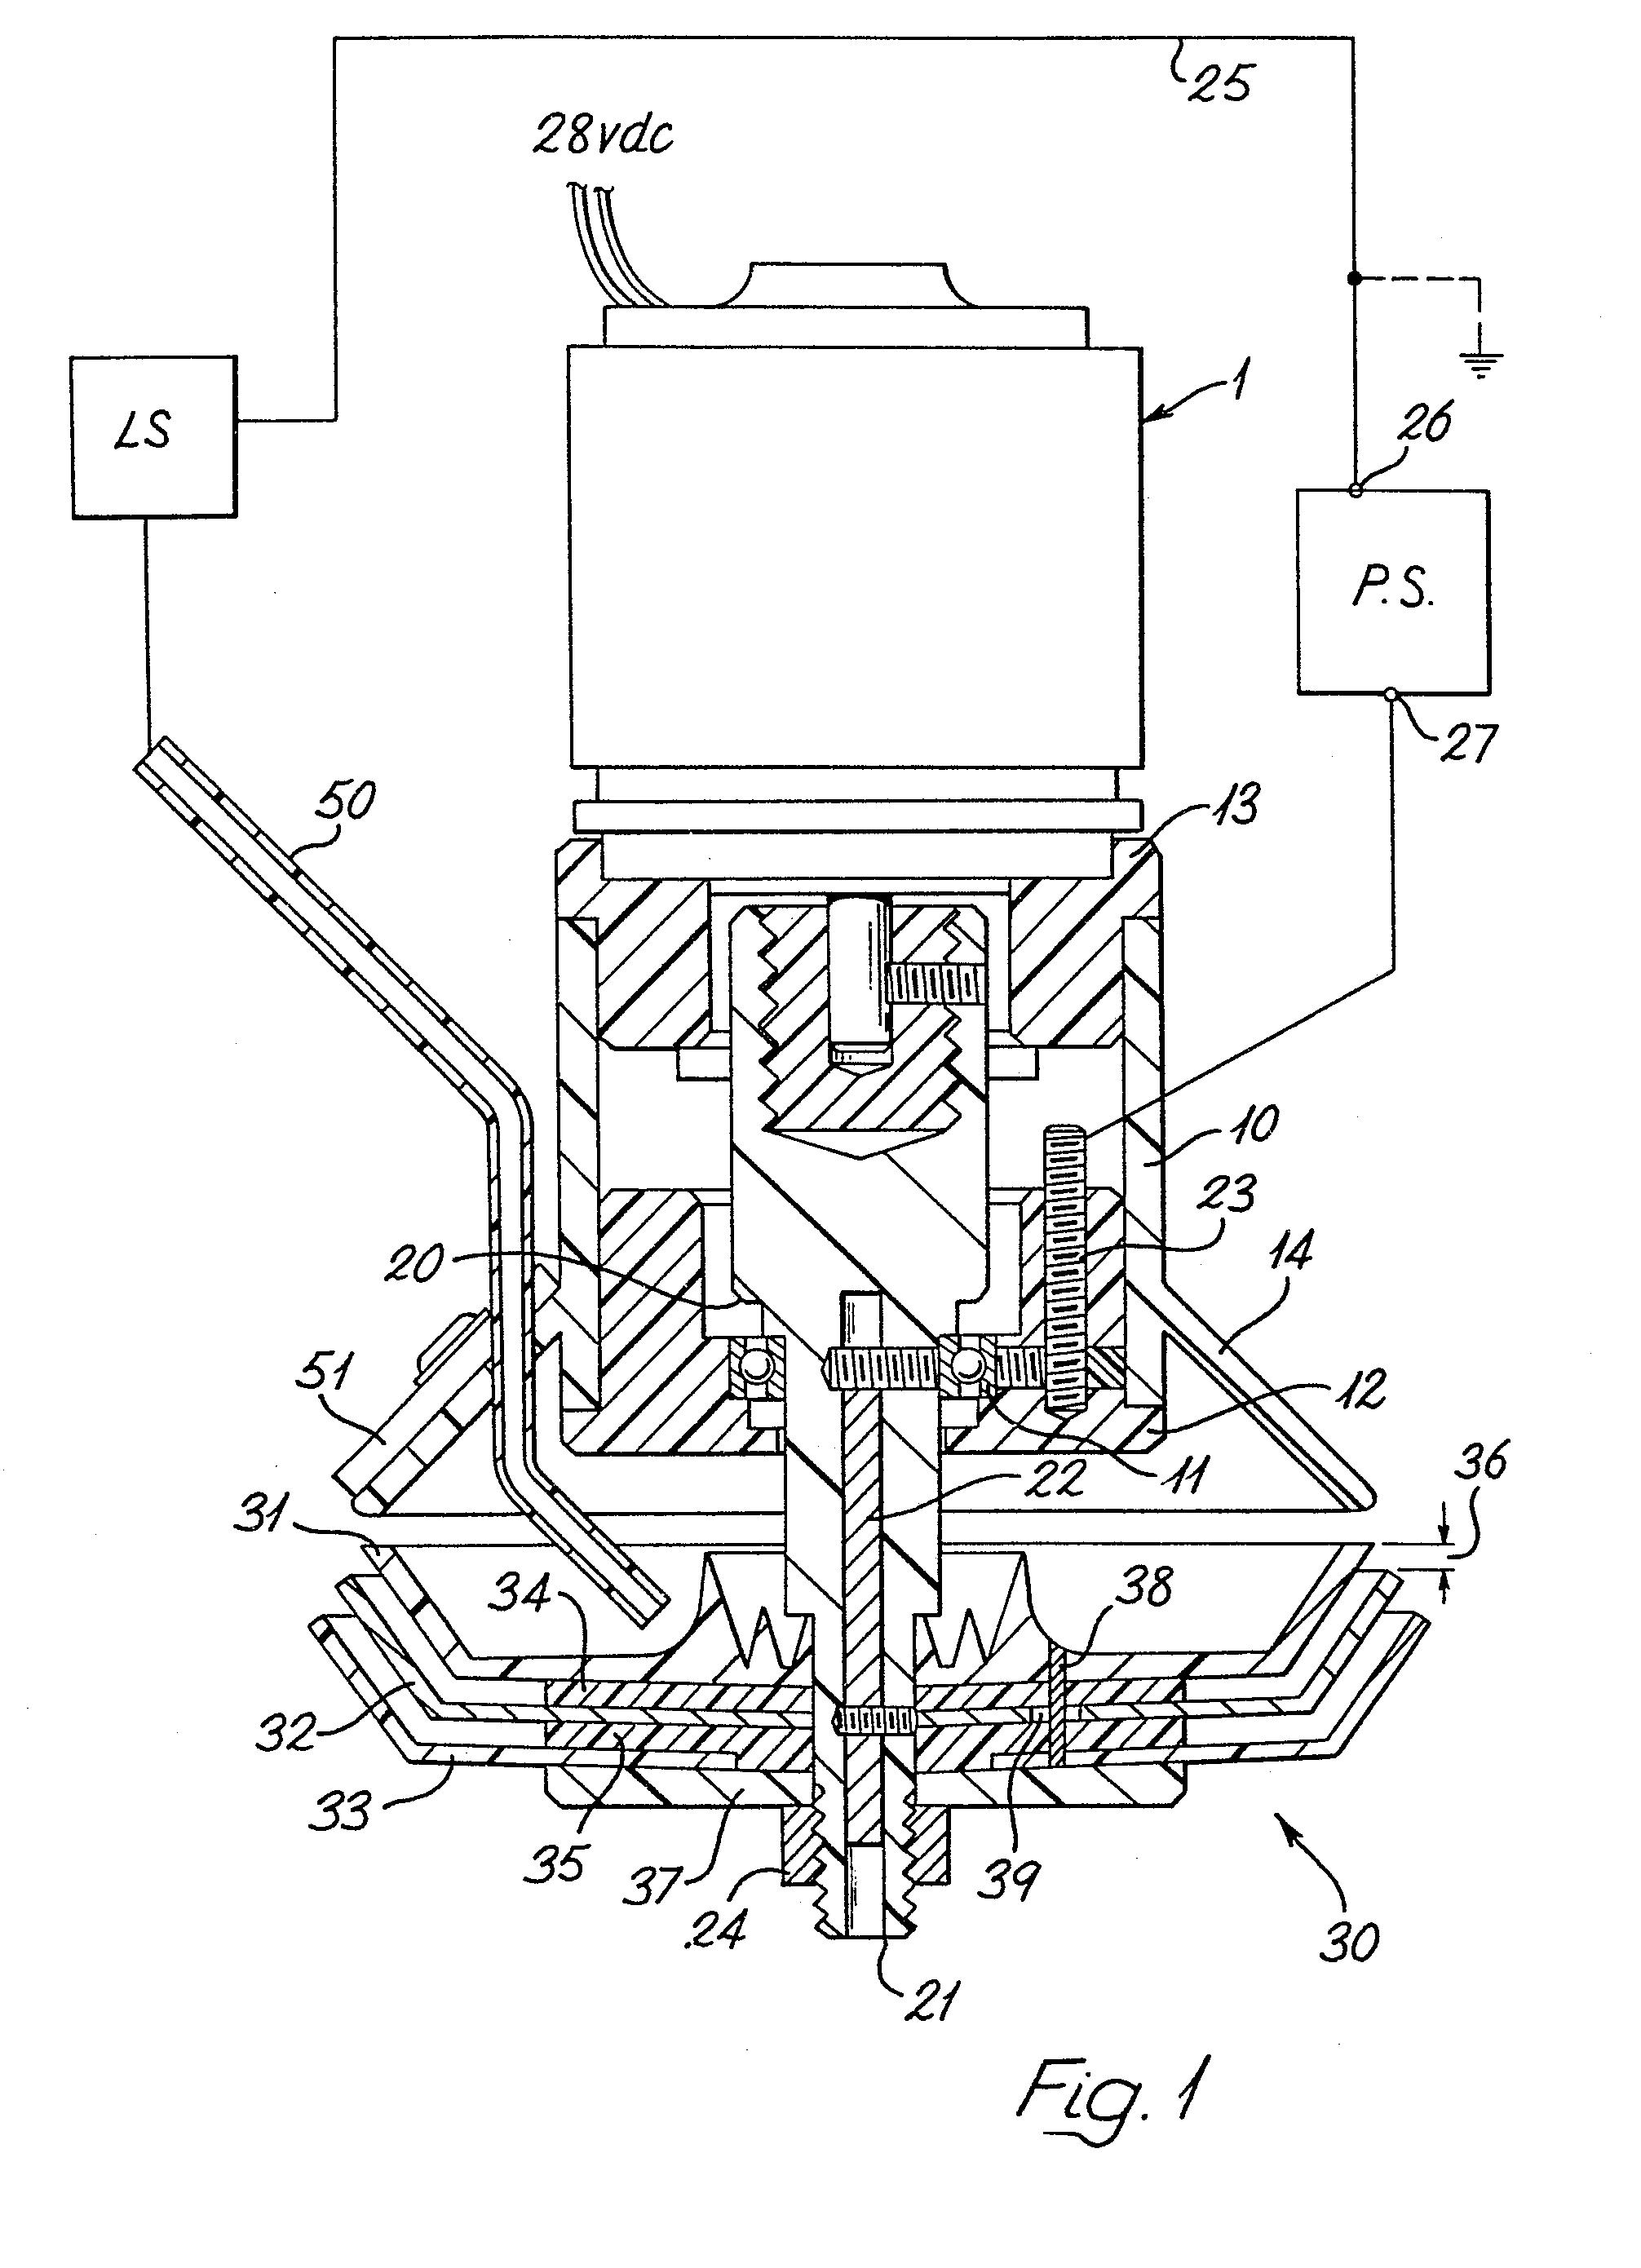 专利ep0118259a2 - elektrostatisches